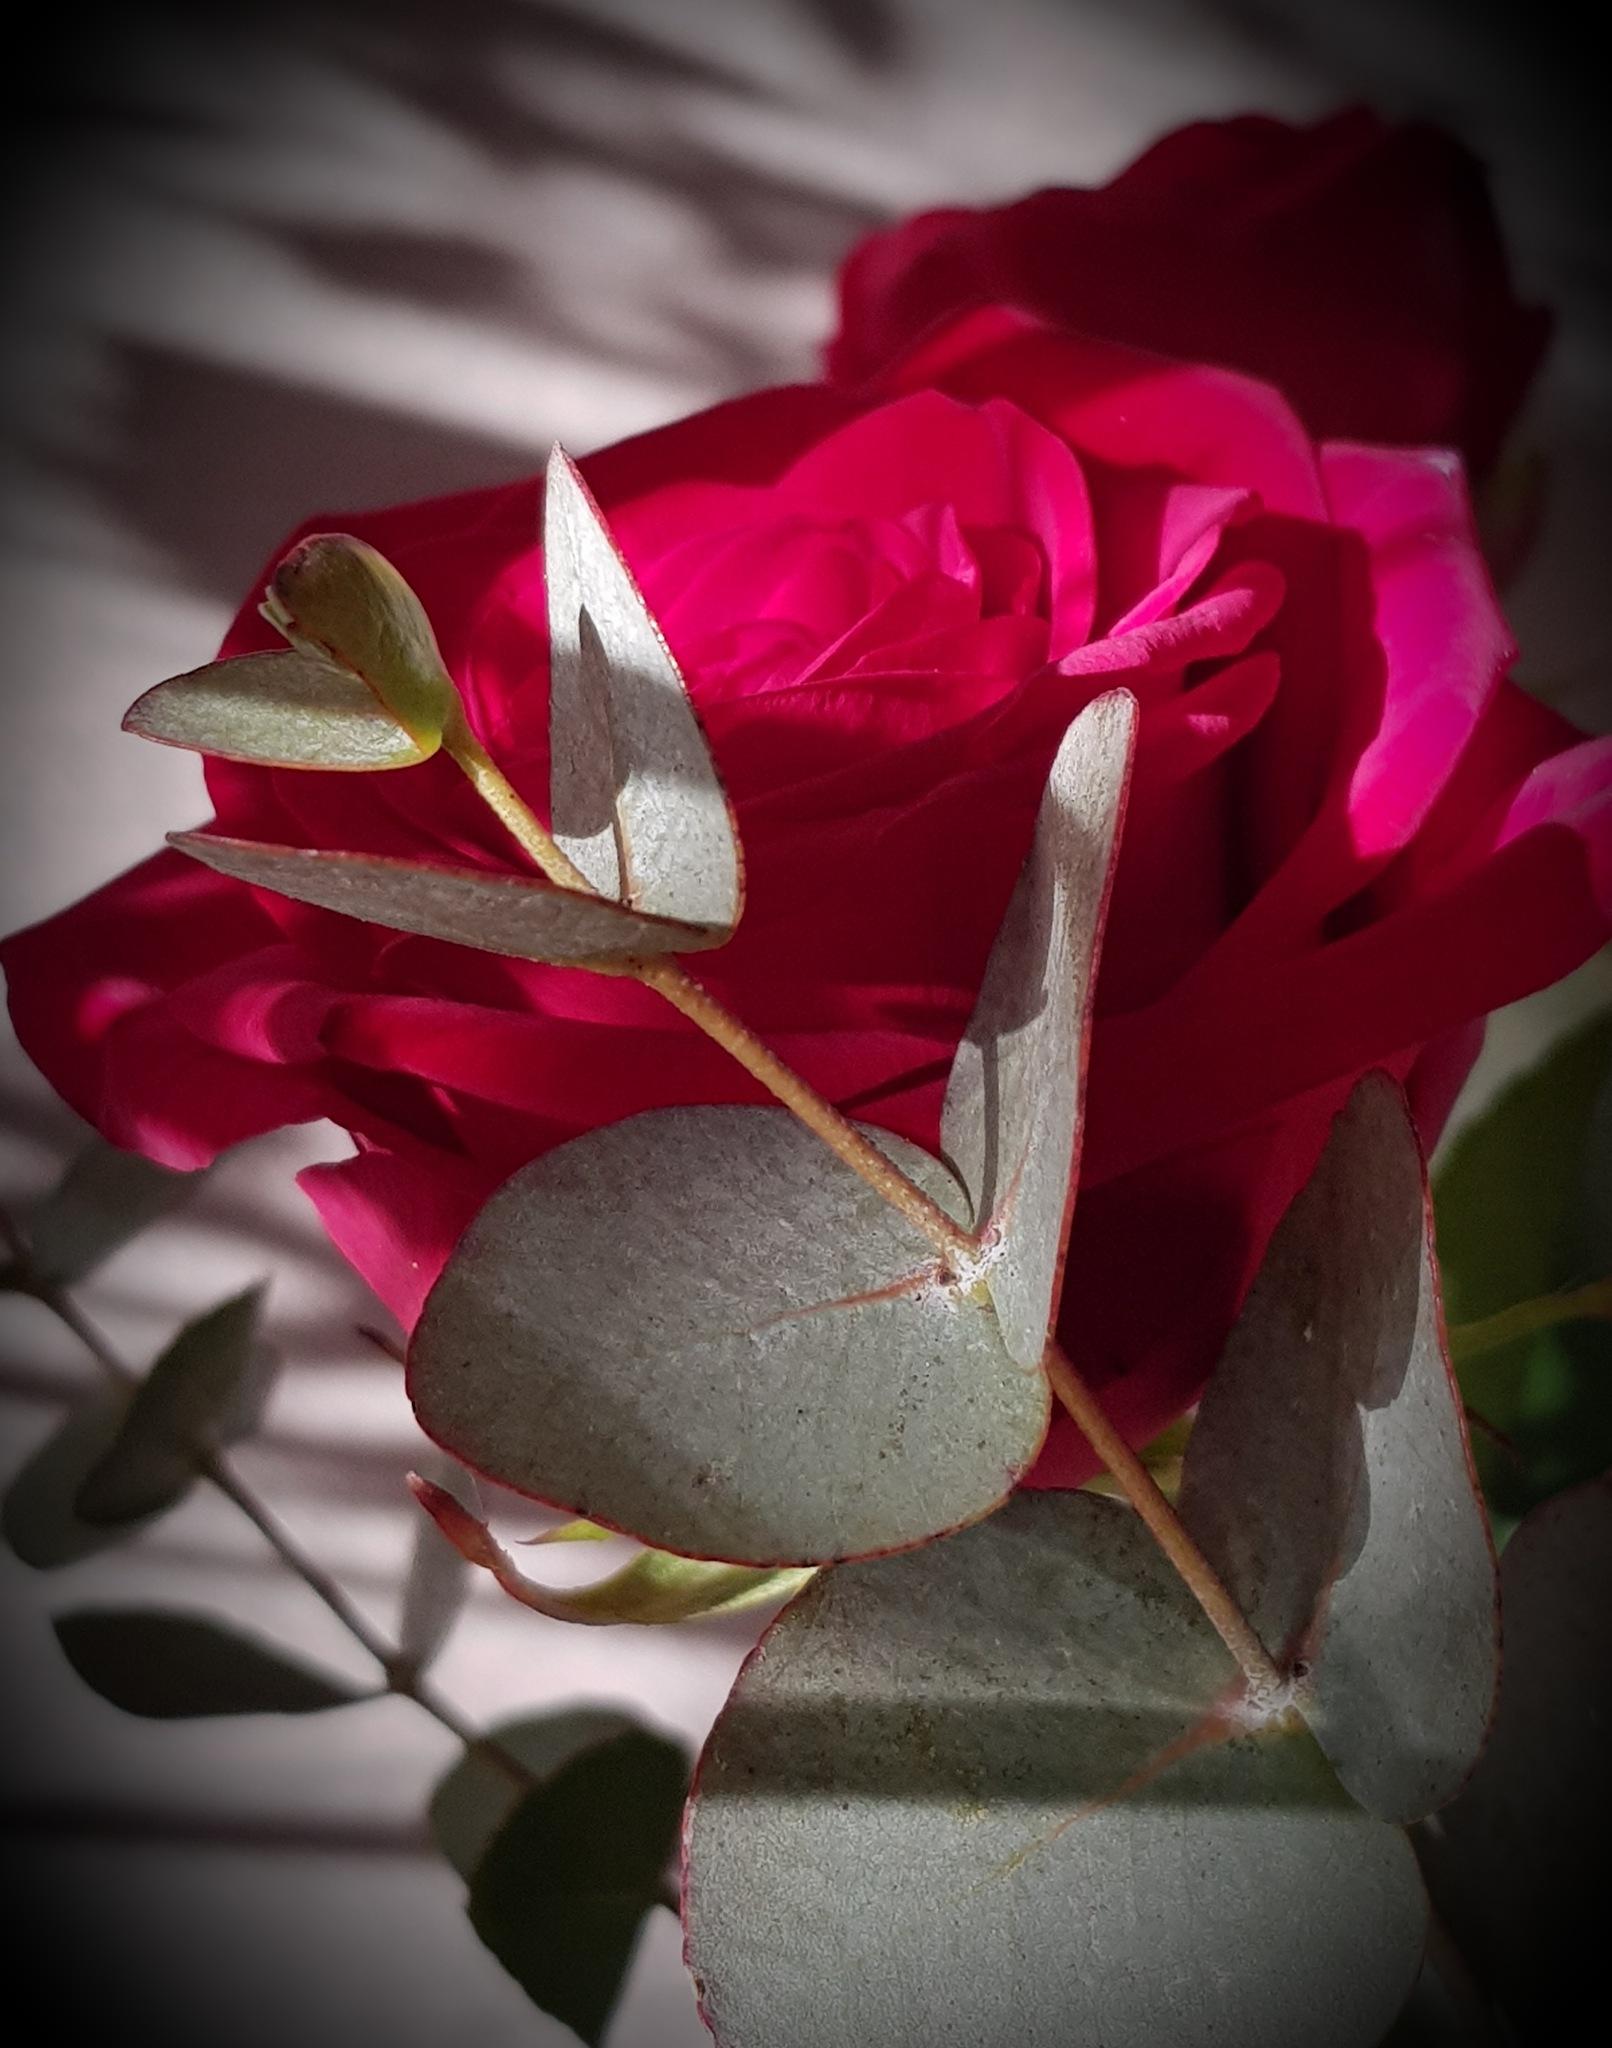 Rose  by Annica Josefsson